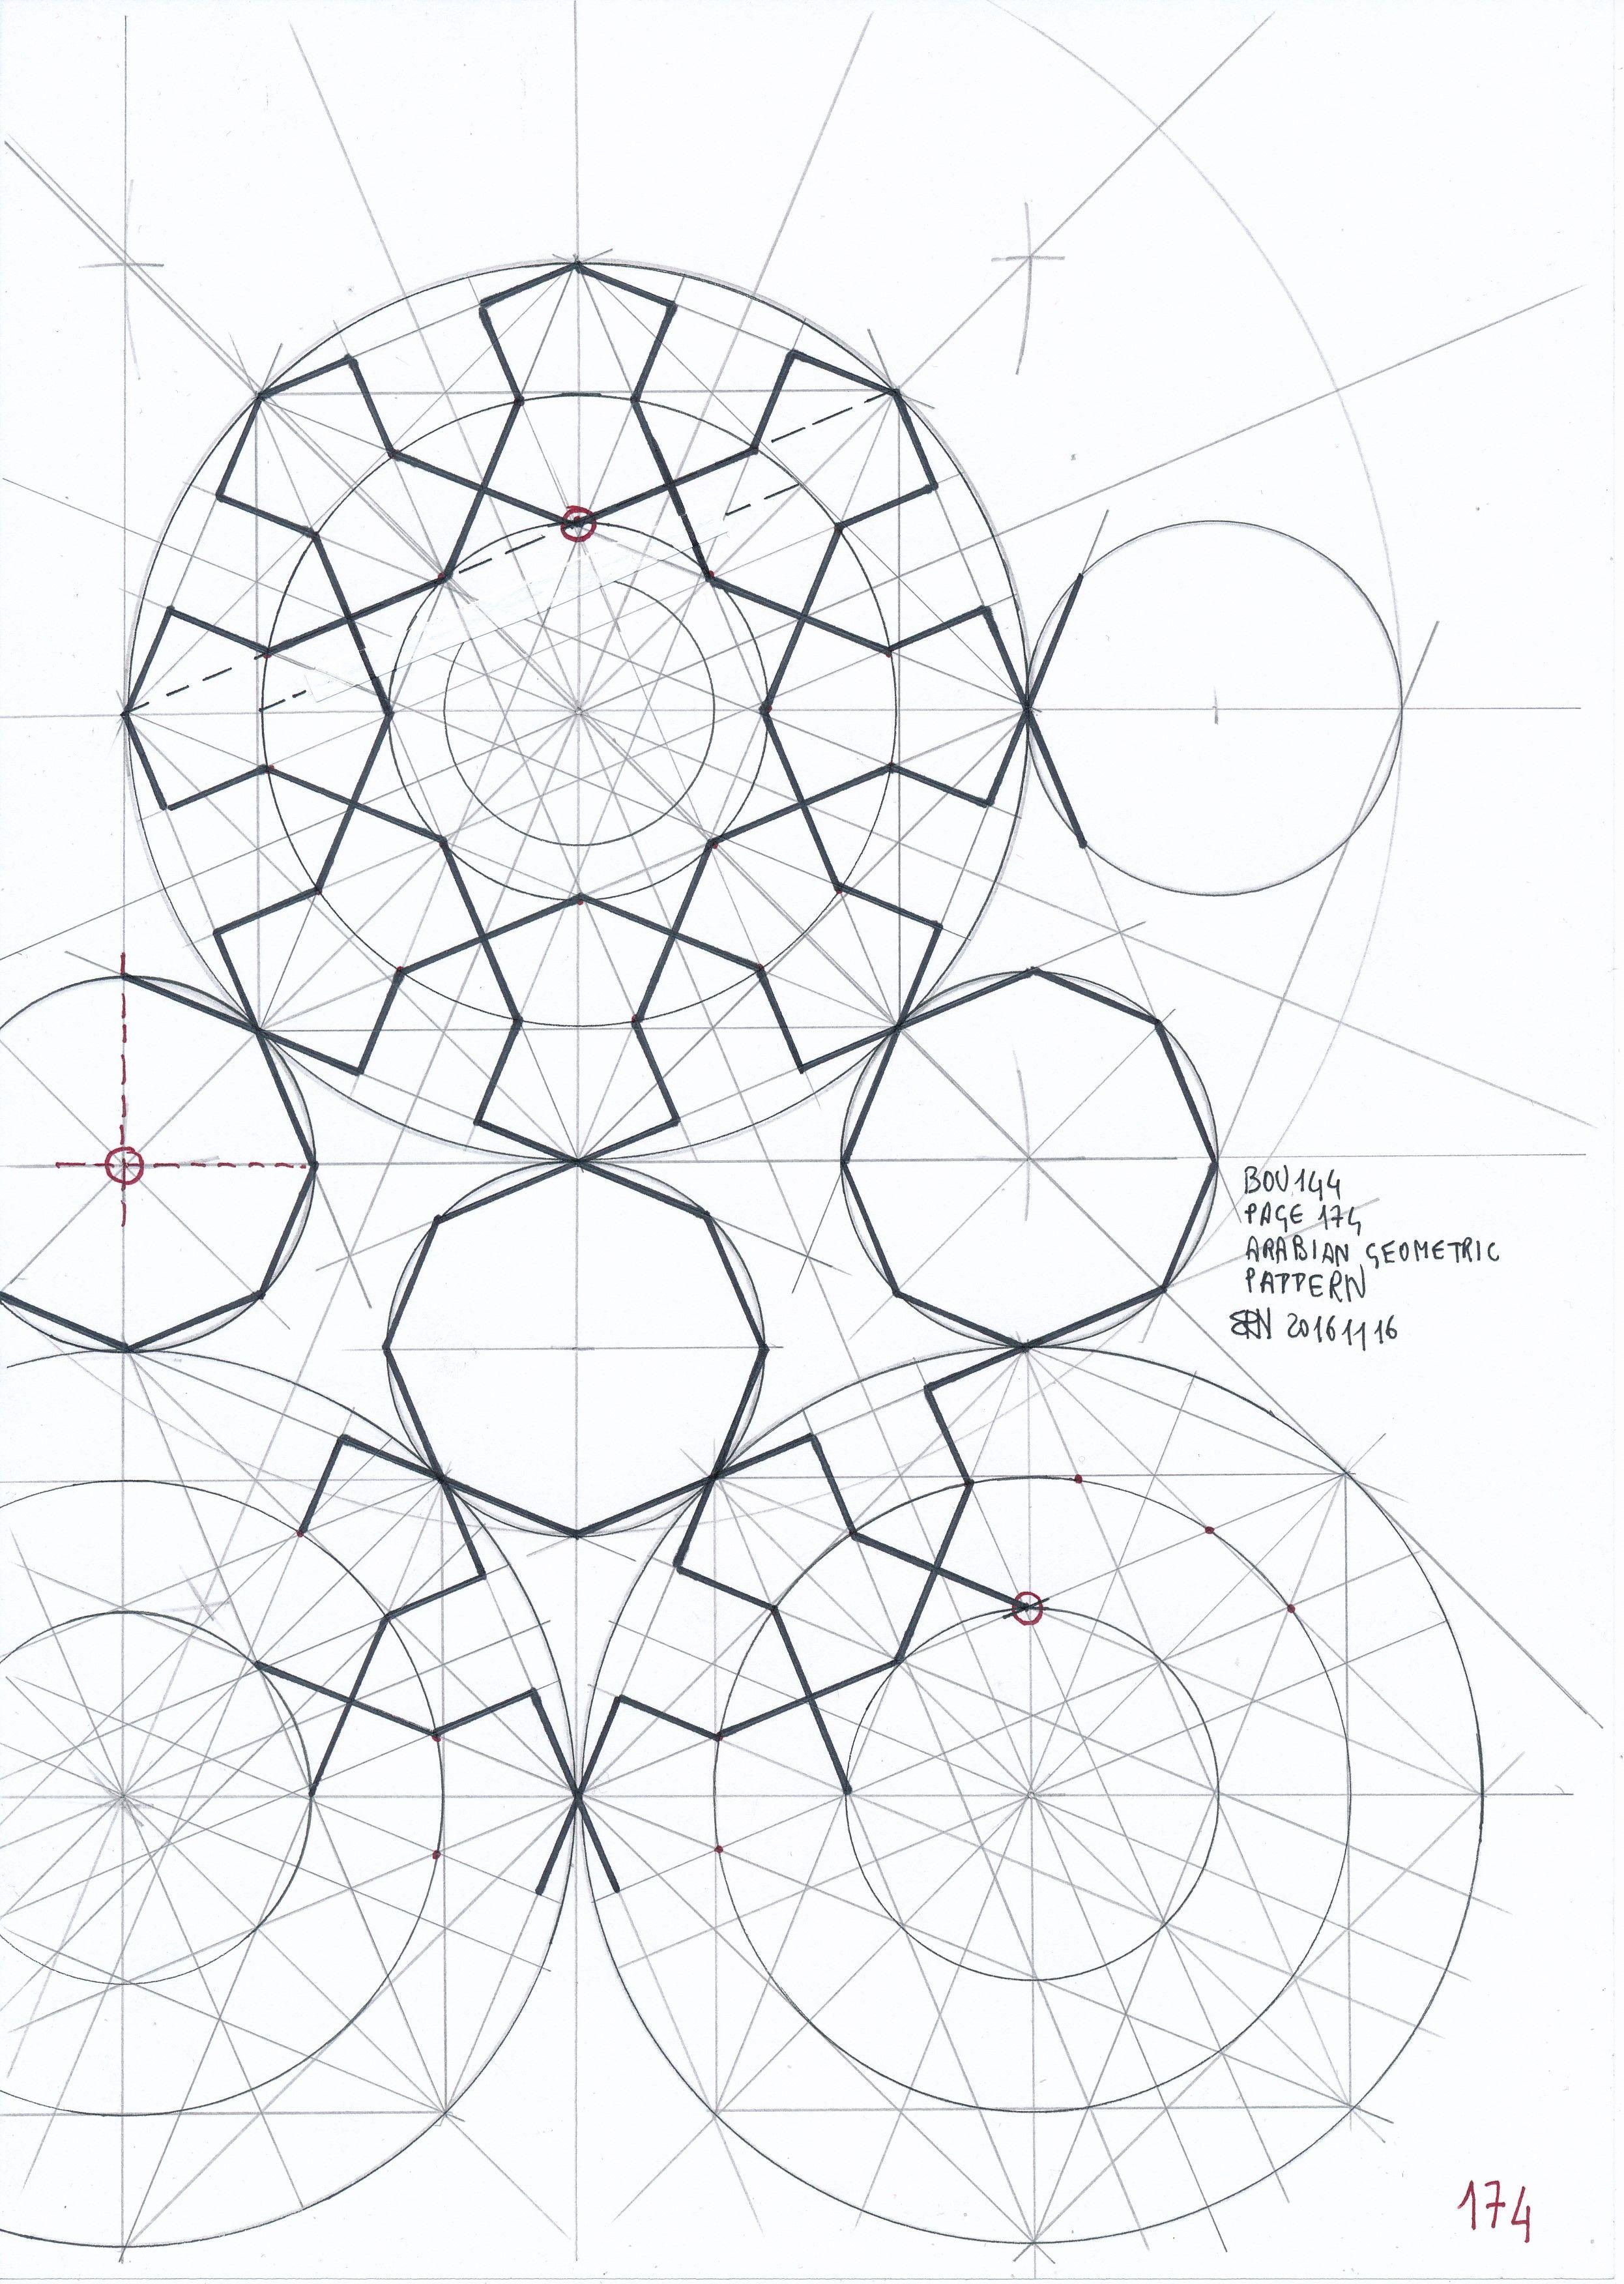 islamicdesign islamicart islamicpattern arabiangeometry geometry mathart regolo54 symmetry